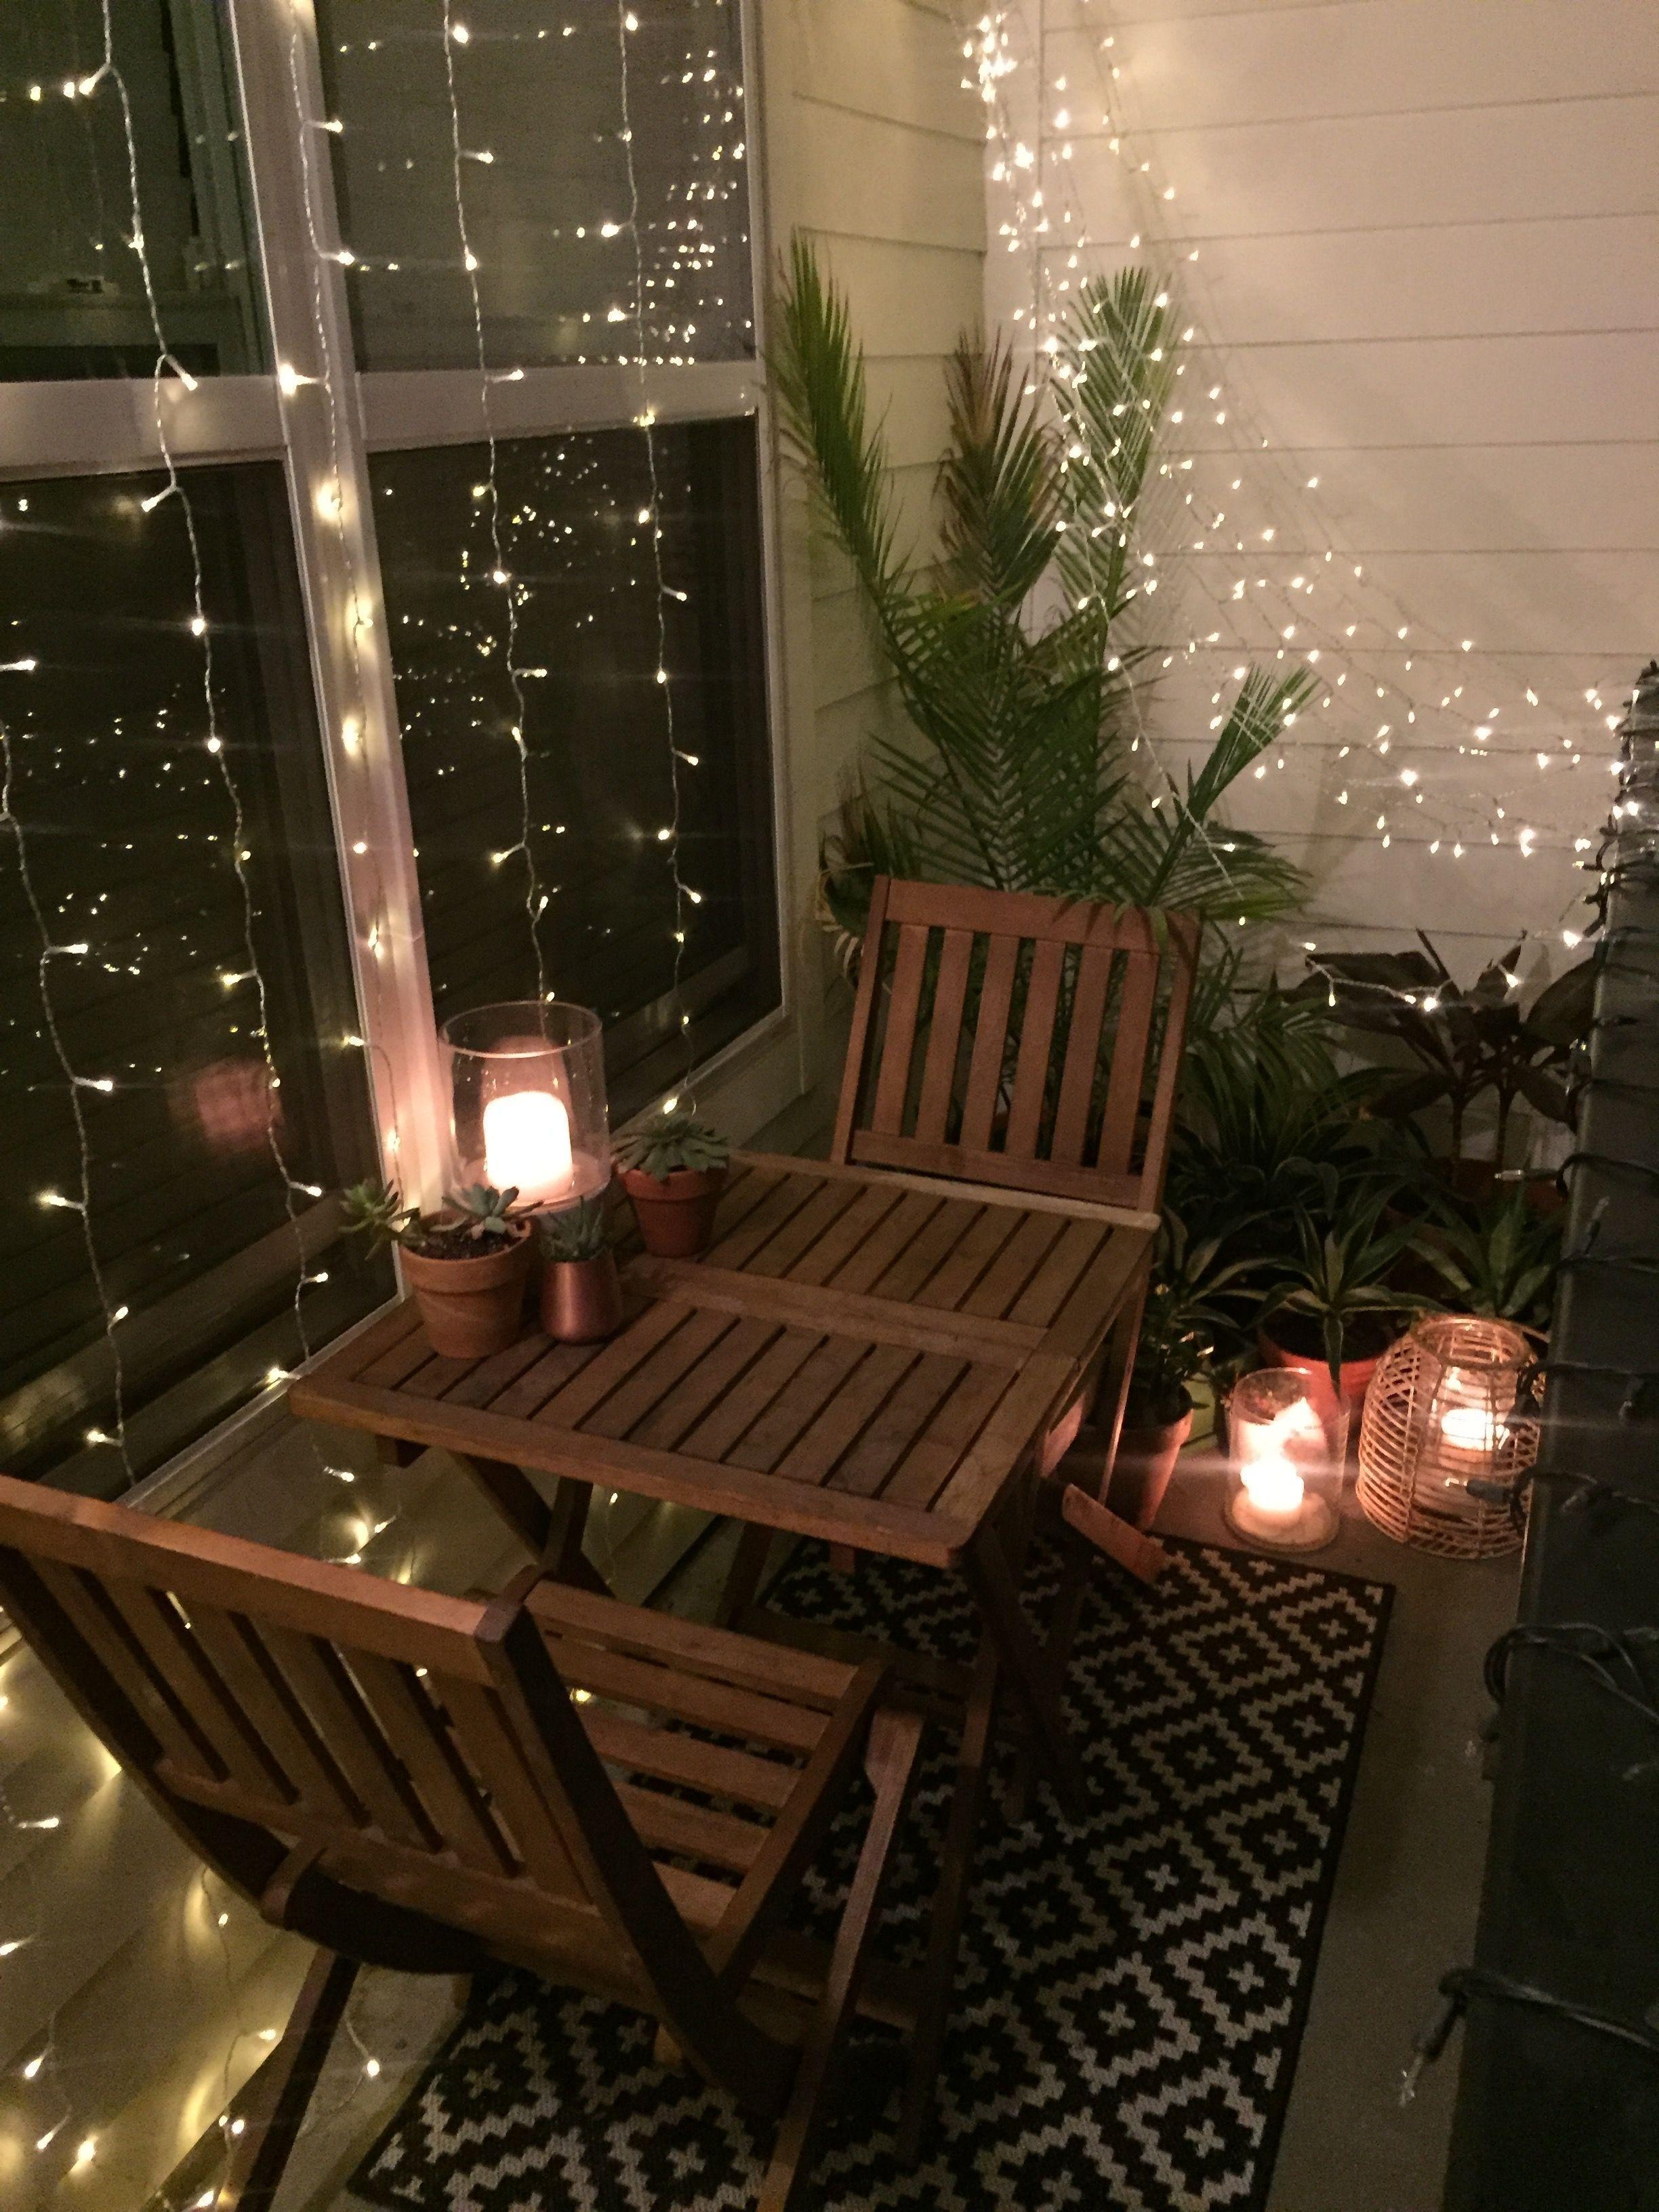 Small Balcony Decor Ideas Small Apartment Balcony Design Ideas For Outdoor Tropical Lanterns (View 15 of 20)